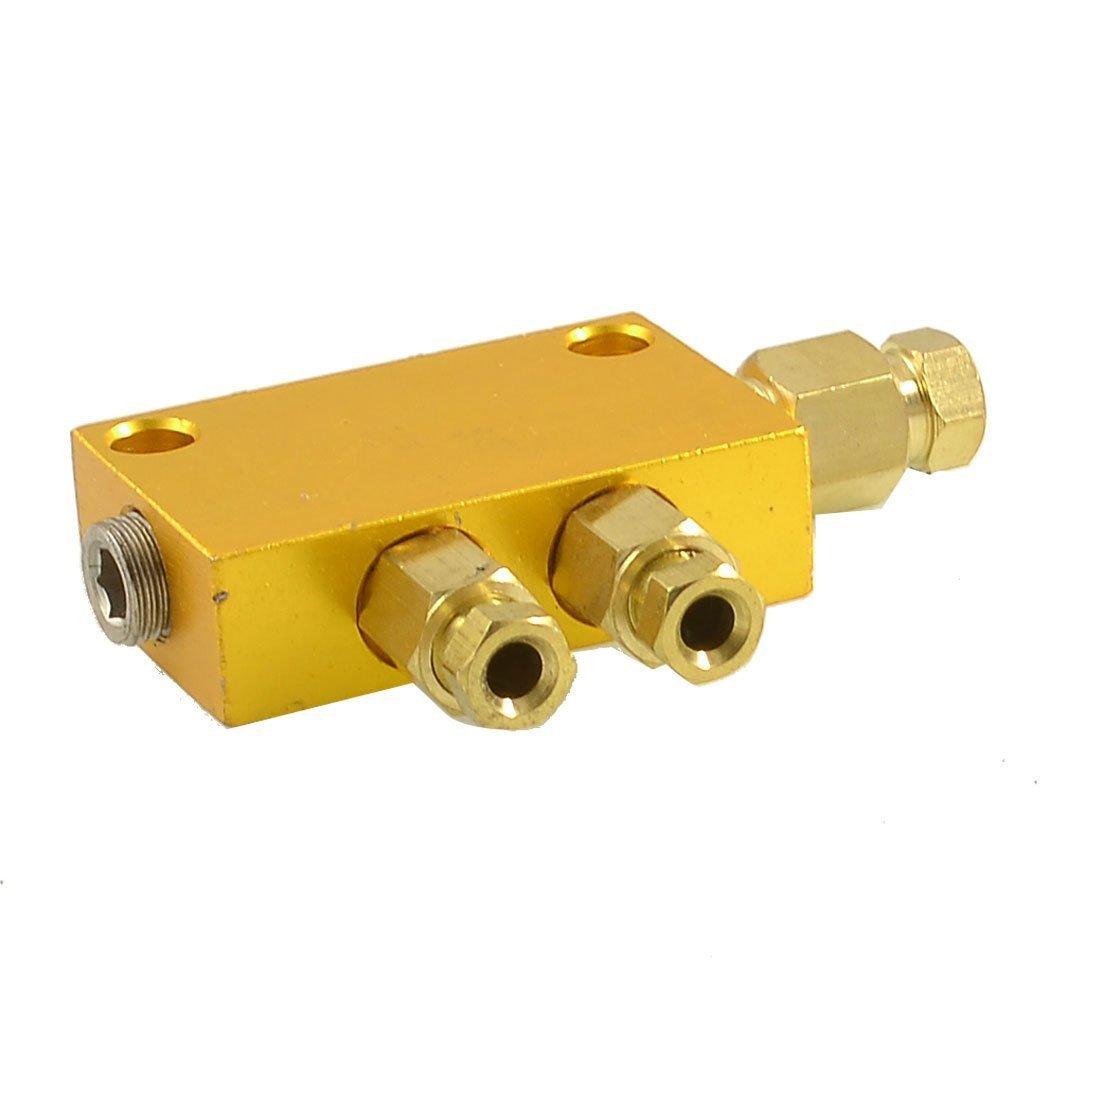 uxcell Air Pneumatic Brass Adjustable 2 Ways Distributor Manifold Block a12092400ux1364